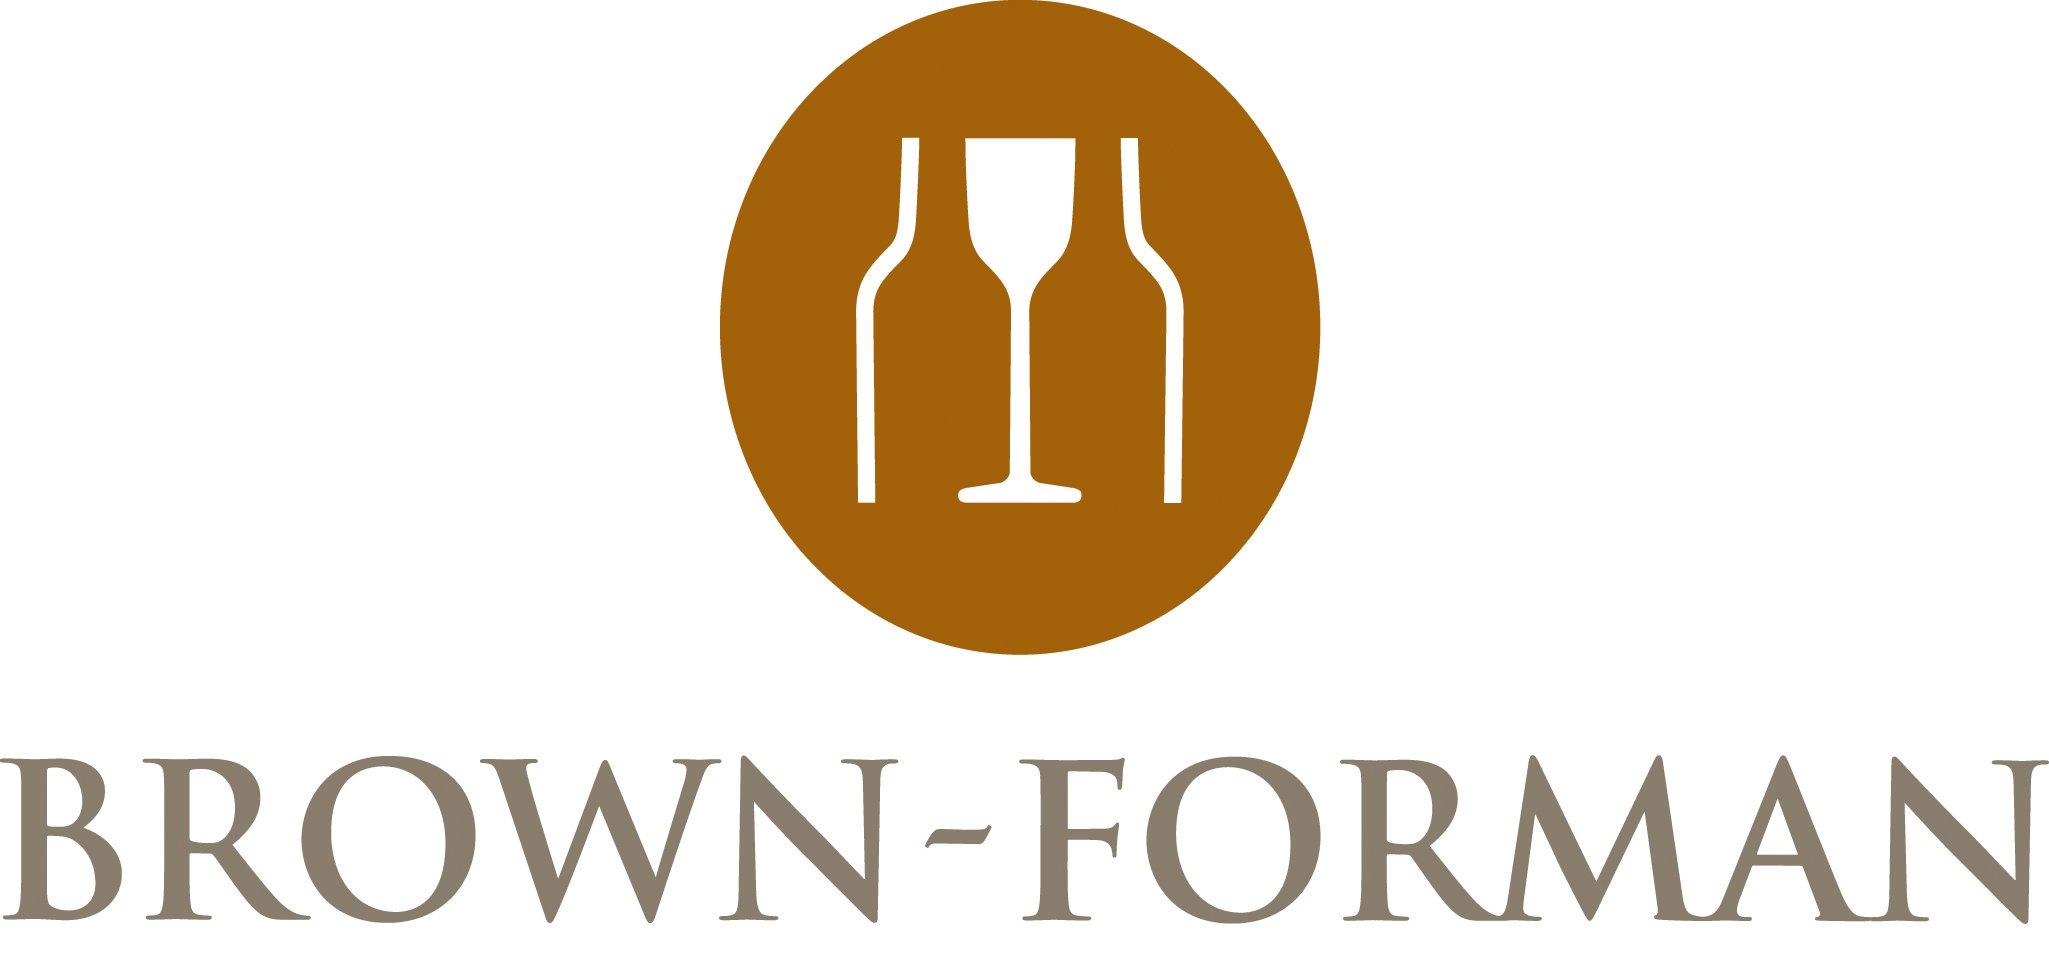 Brown-forman (bf.b) Vs. Crimson Wine Group (otcmkts:cwgl) Critical Analysis photo